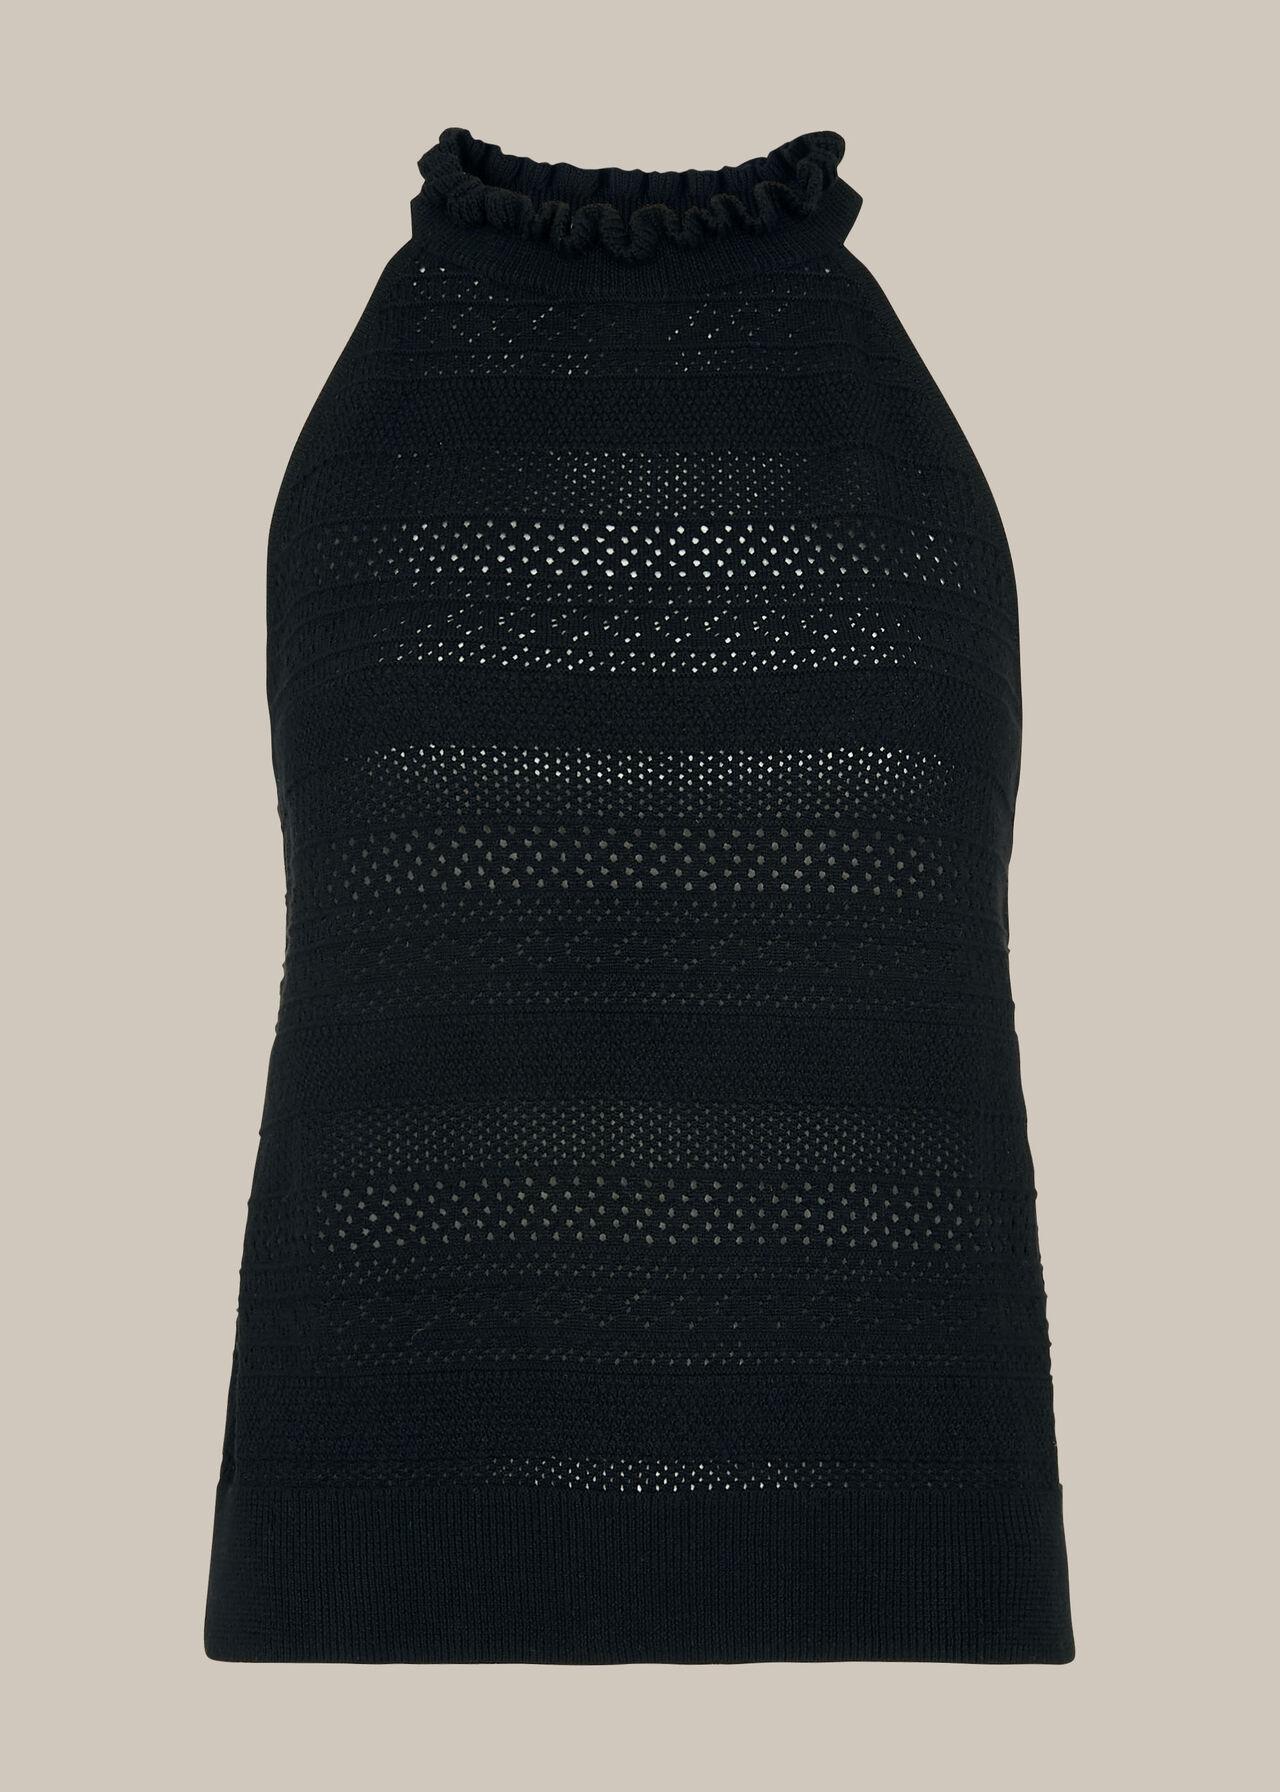 Pointelle High Neck Knit